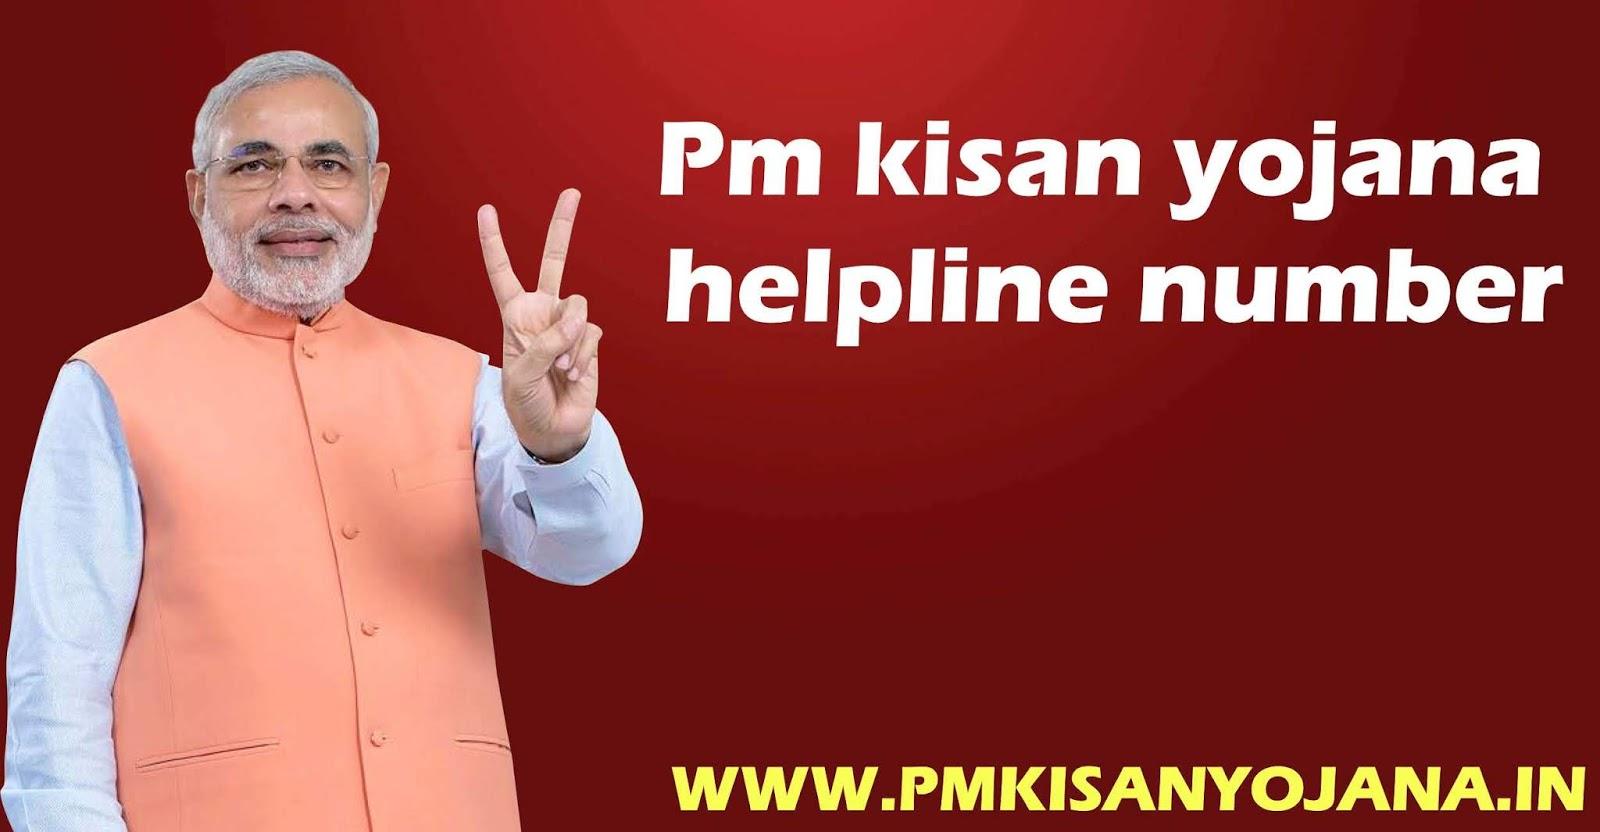 pm kisan yojana helpline number